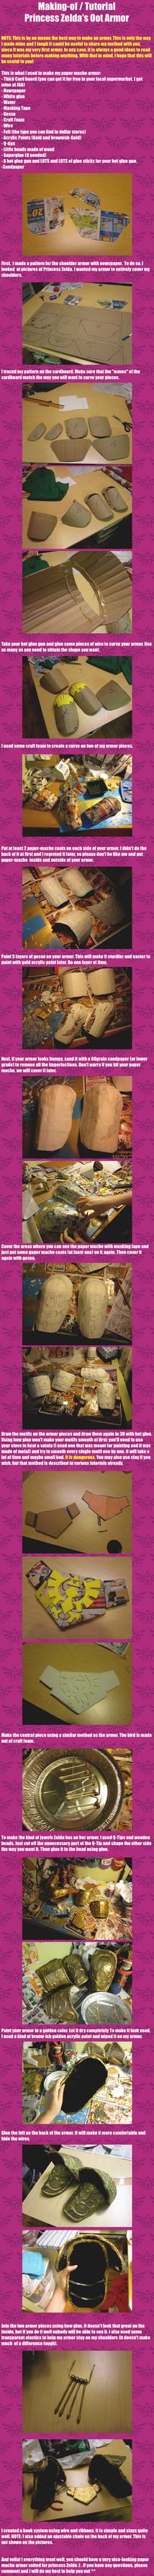 Making-of / Tutorial of Princess Zelda's OoT armor